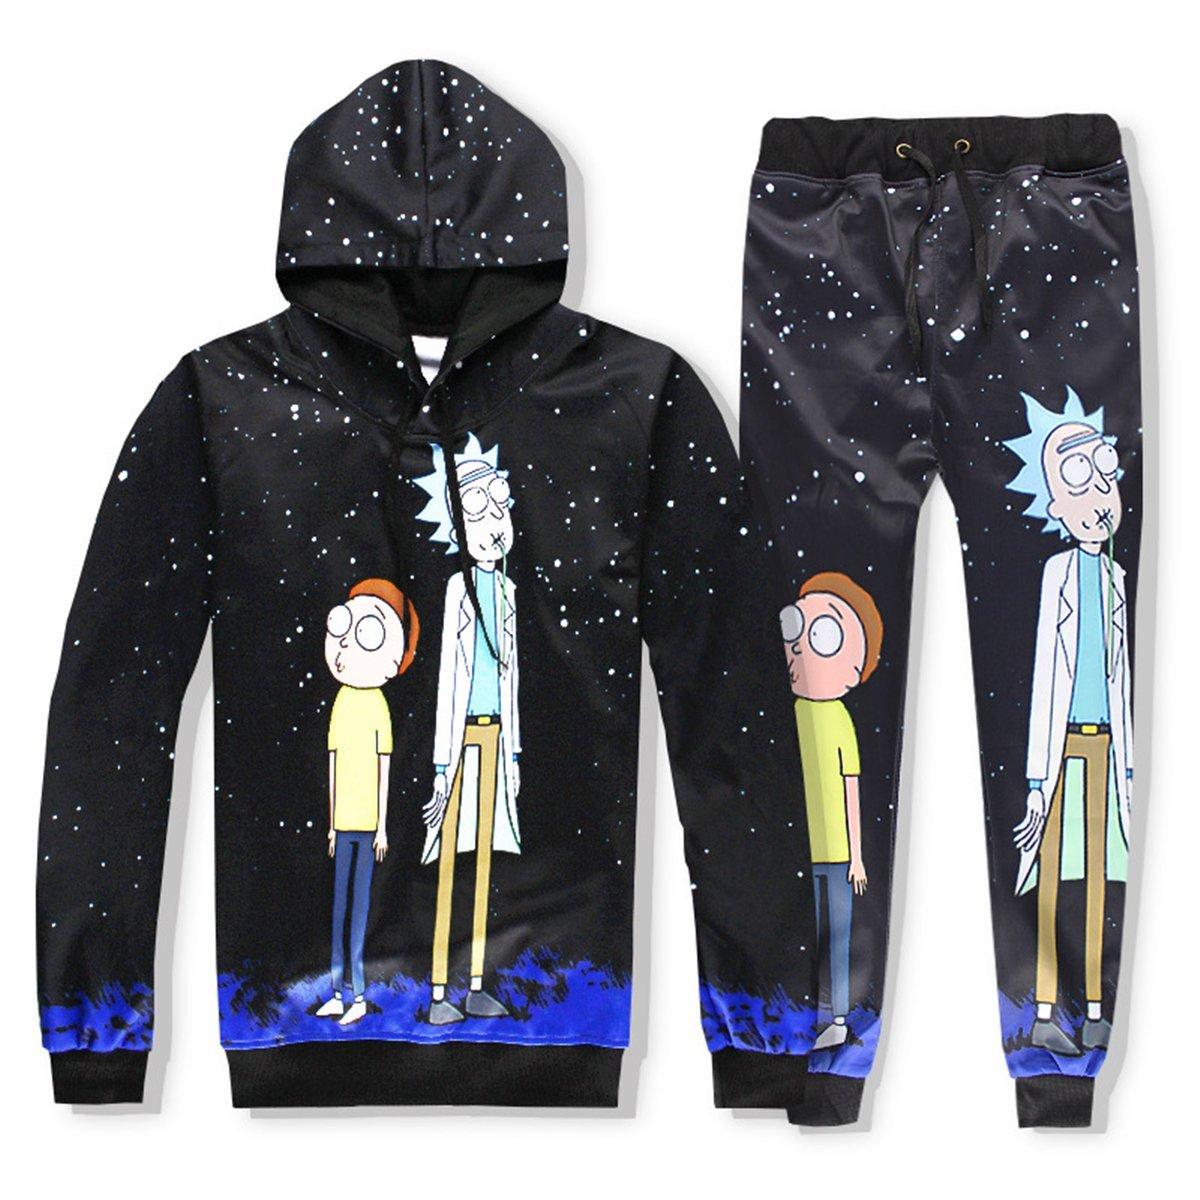 Men's Clothing Bright Custom Sweatshirt Logo Print Name Embroidery Men Shirt Hip Hop Fashion Women Made Brand Shop Jacket Clothing Dropshipping